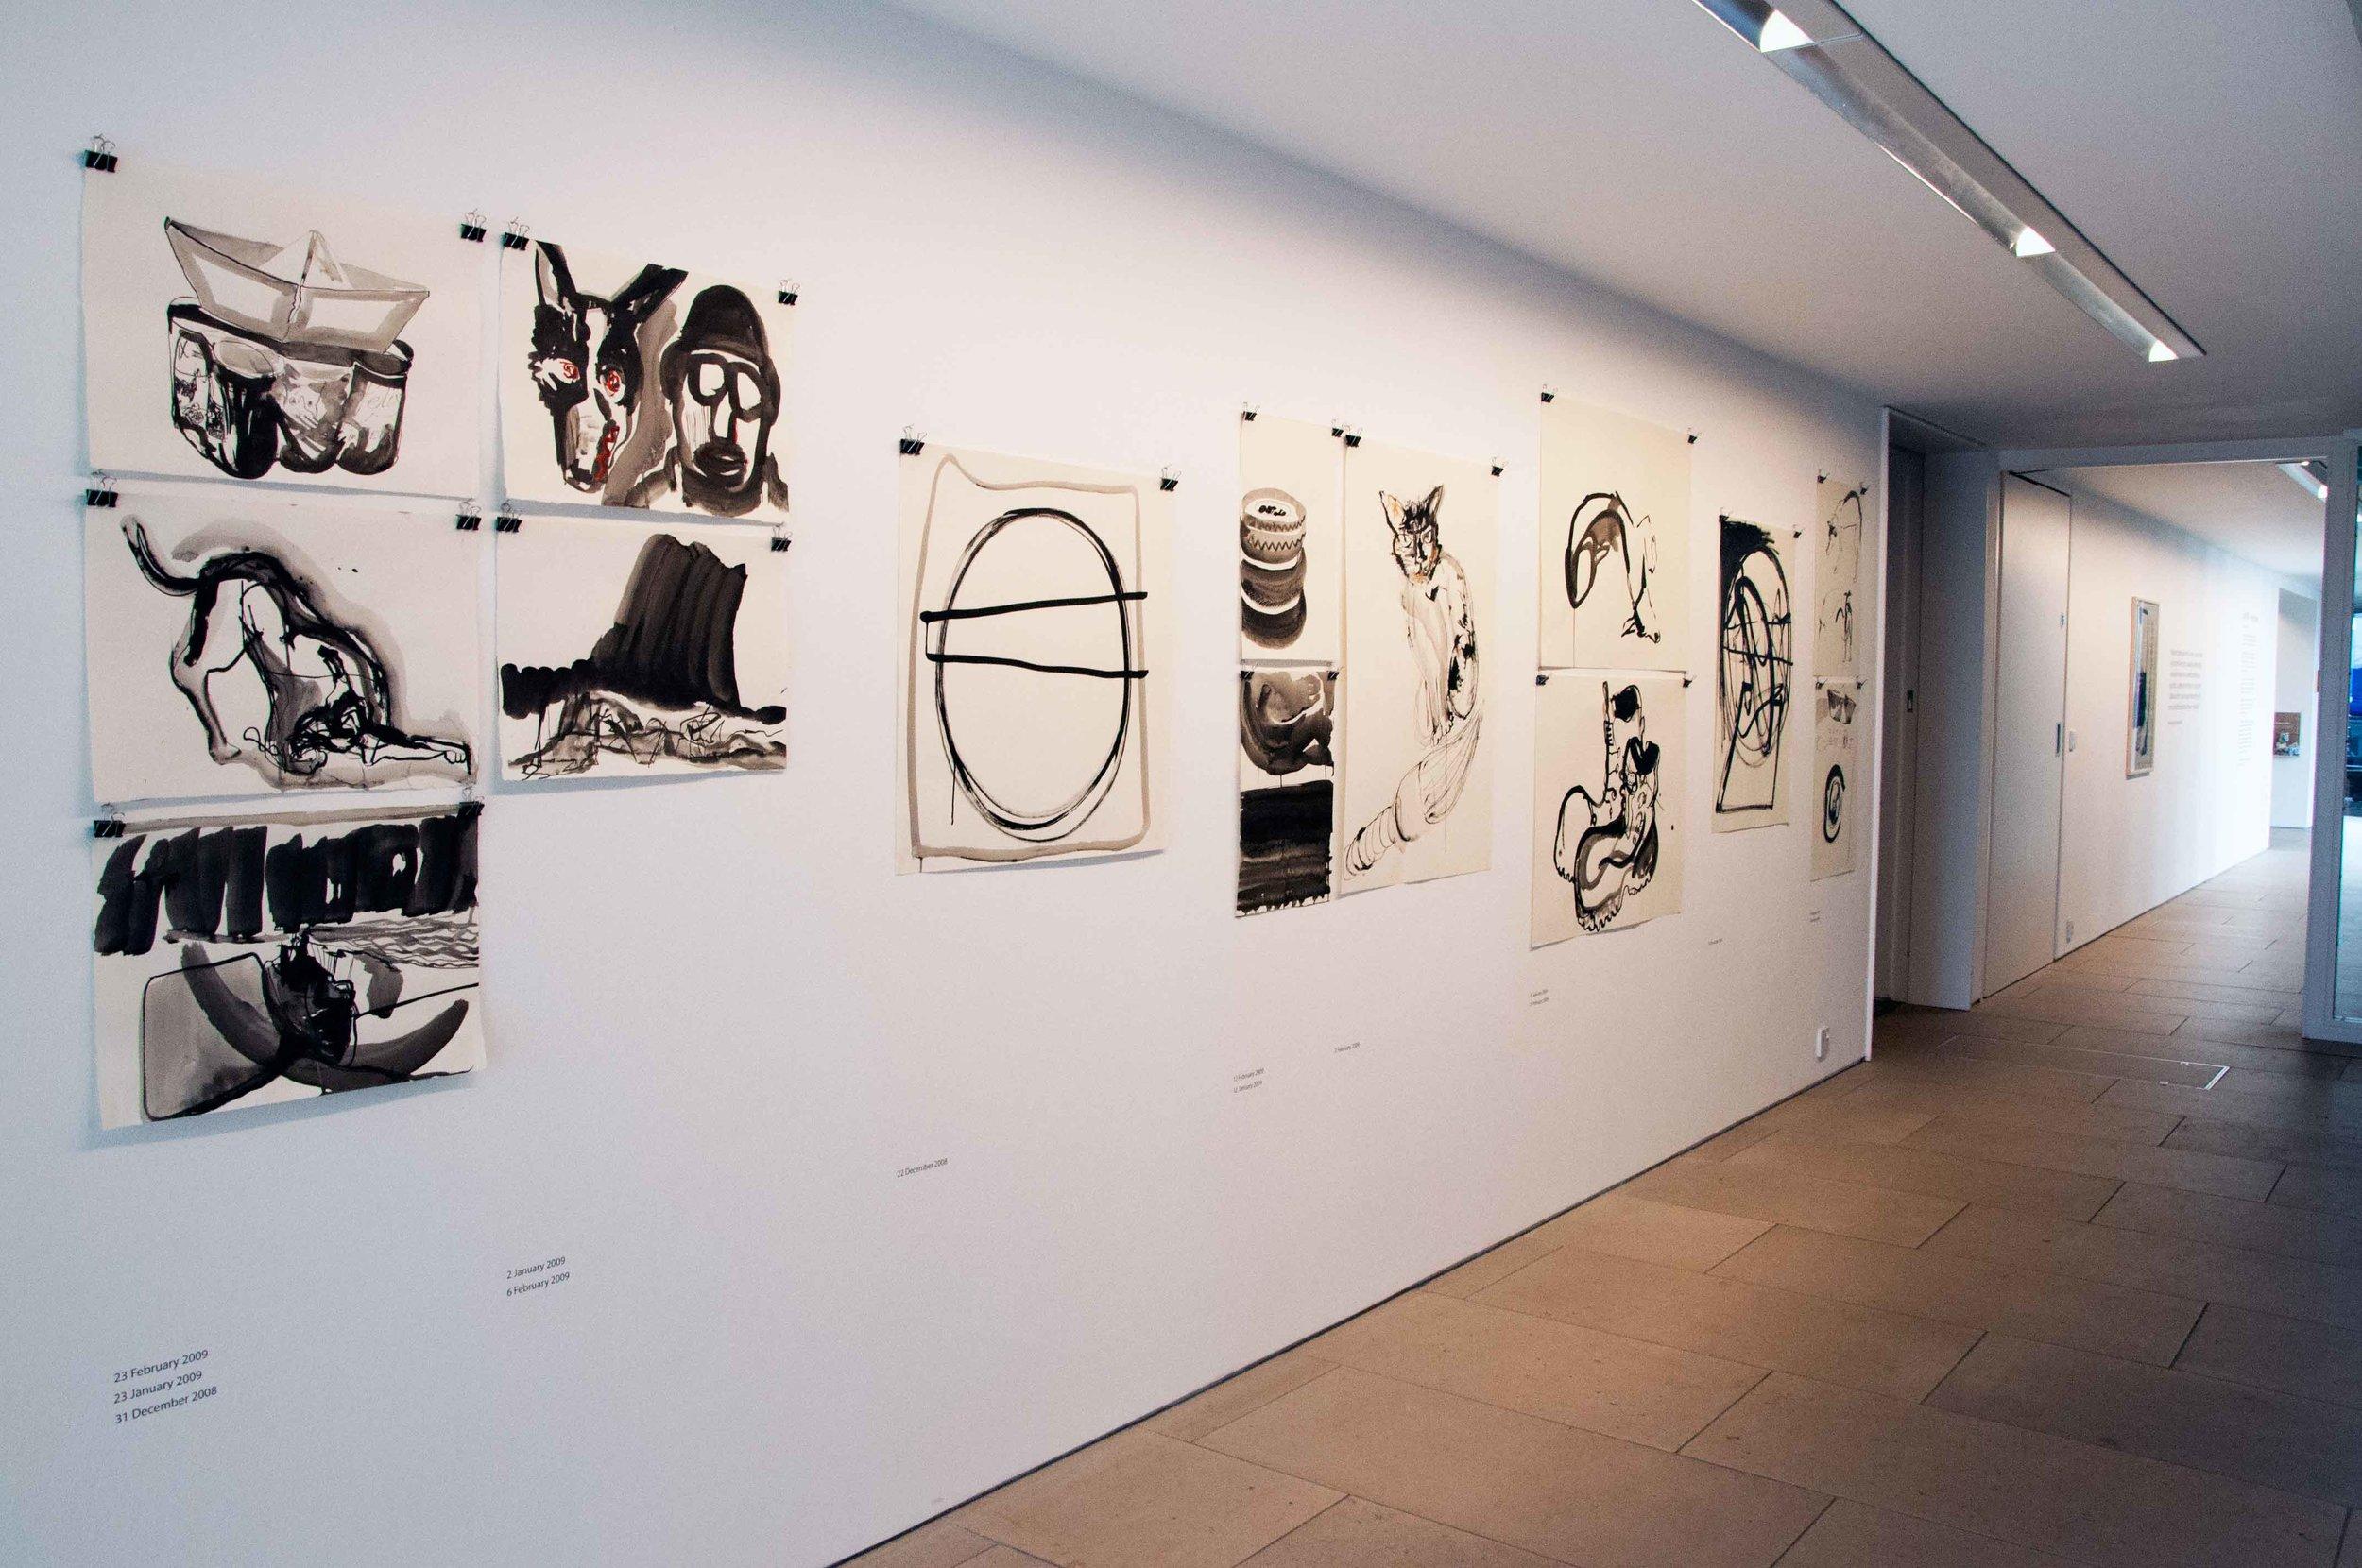 Neville-Gabie-Exhibition-View-Emailing-Antarctica-Drawings.jpg